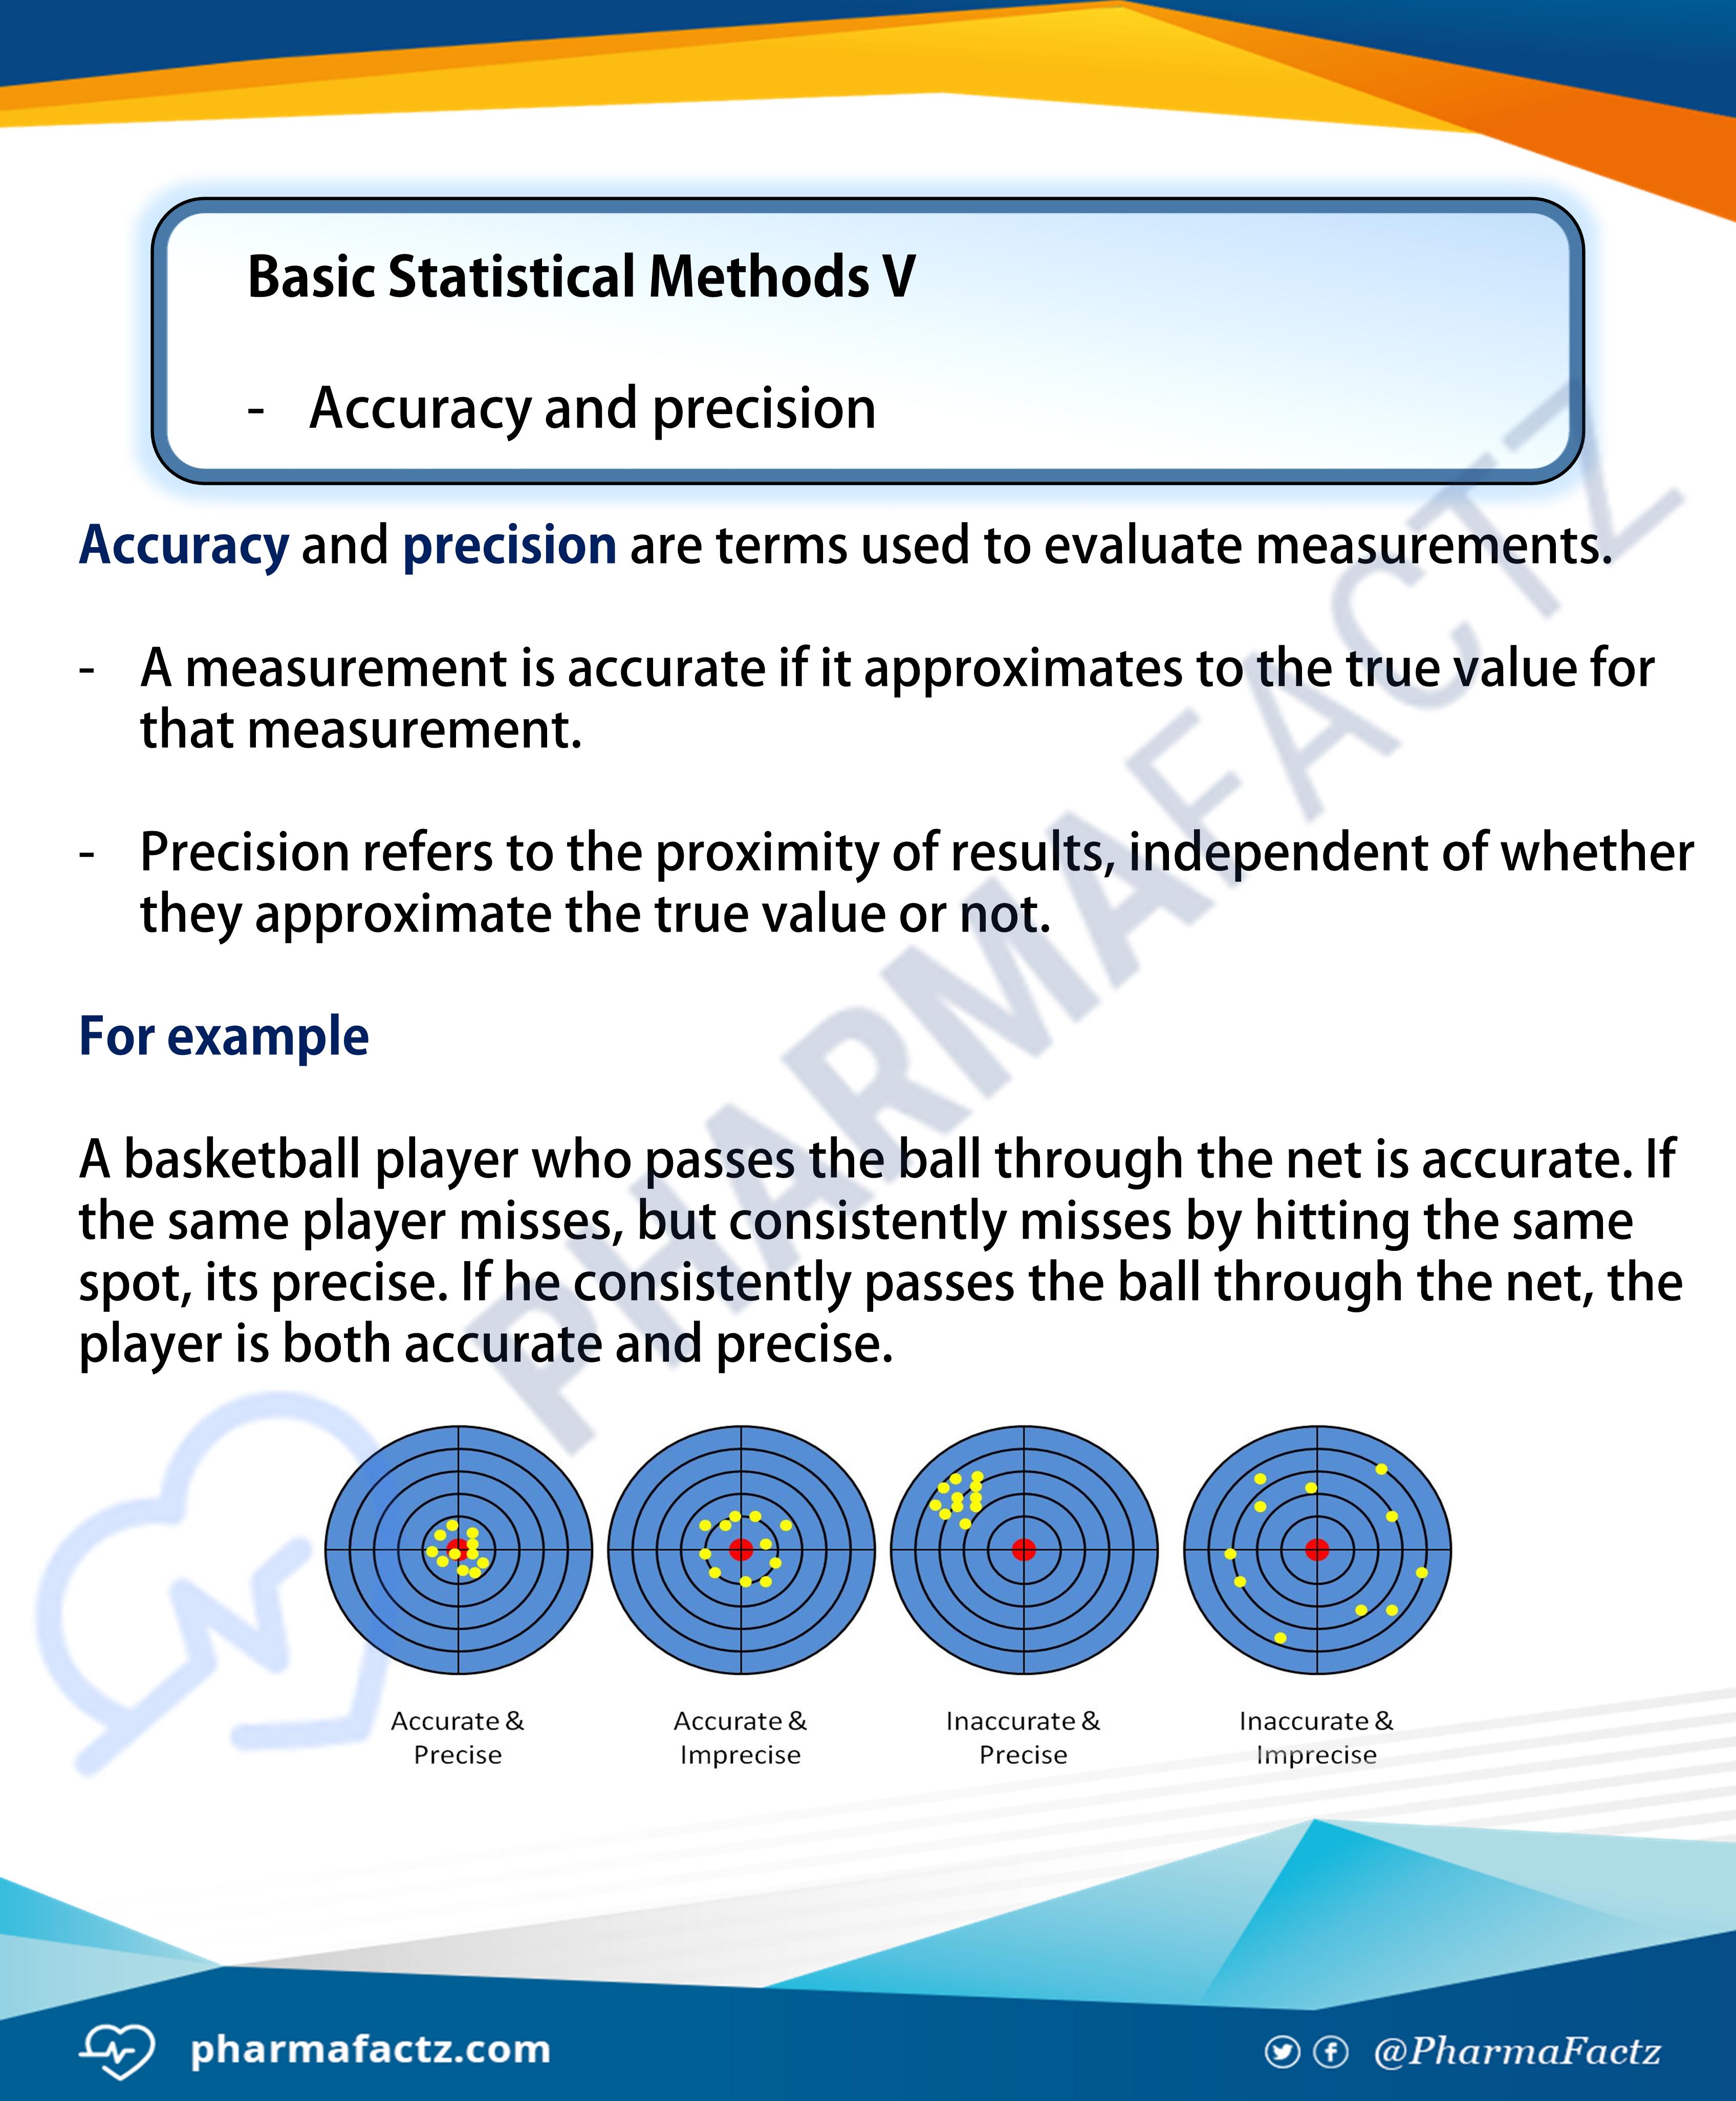 Basic Statistical Methods 5